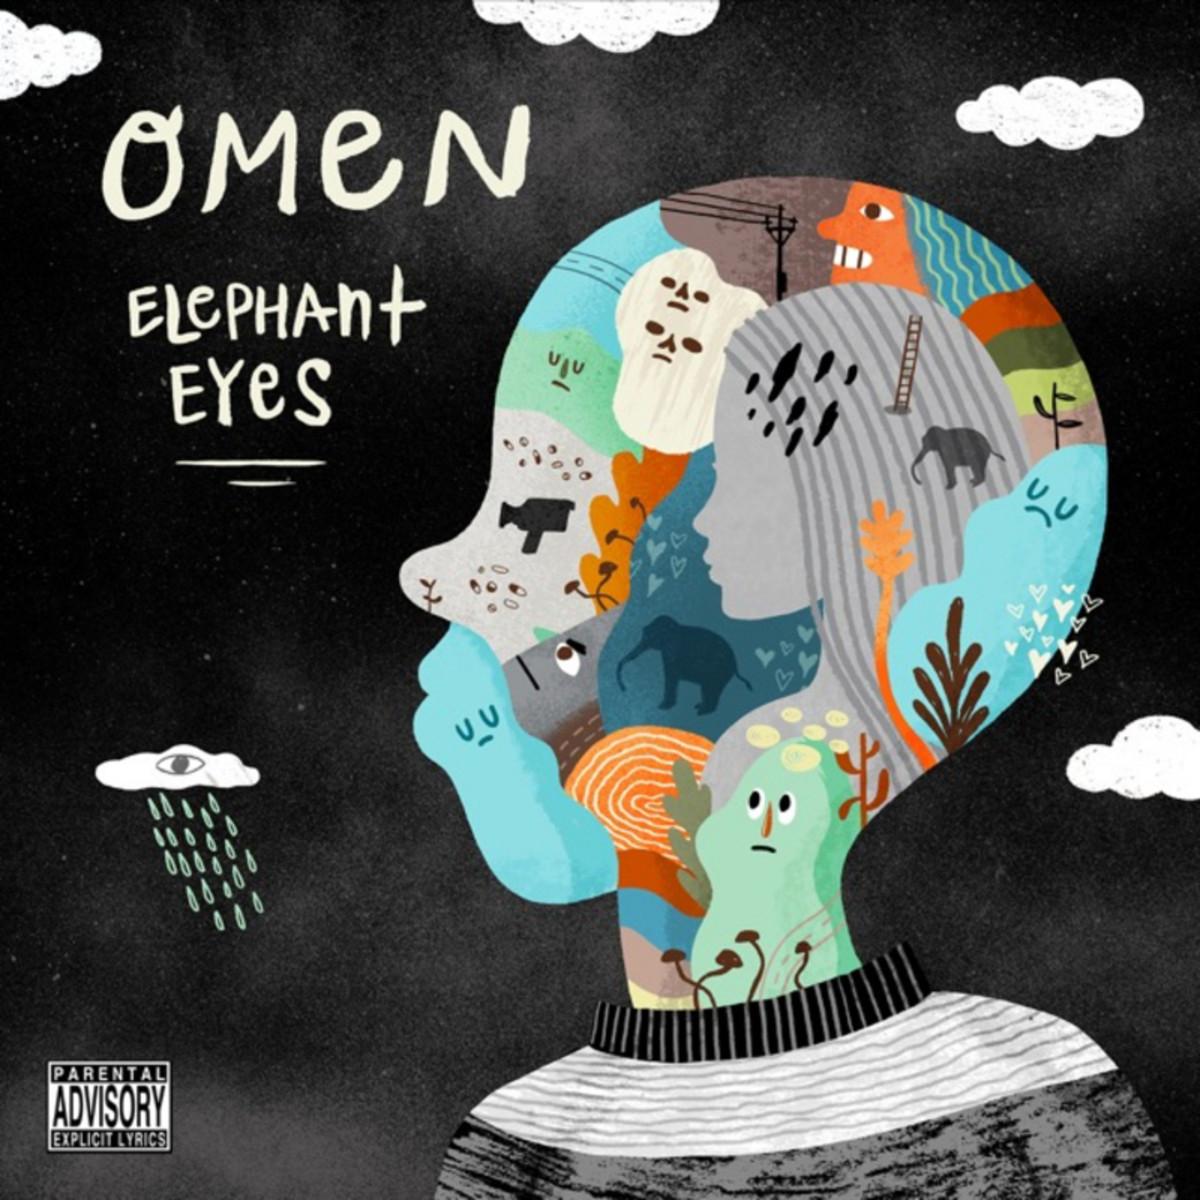 Omen Elephant Eyes artwork